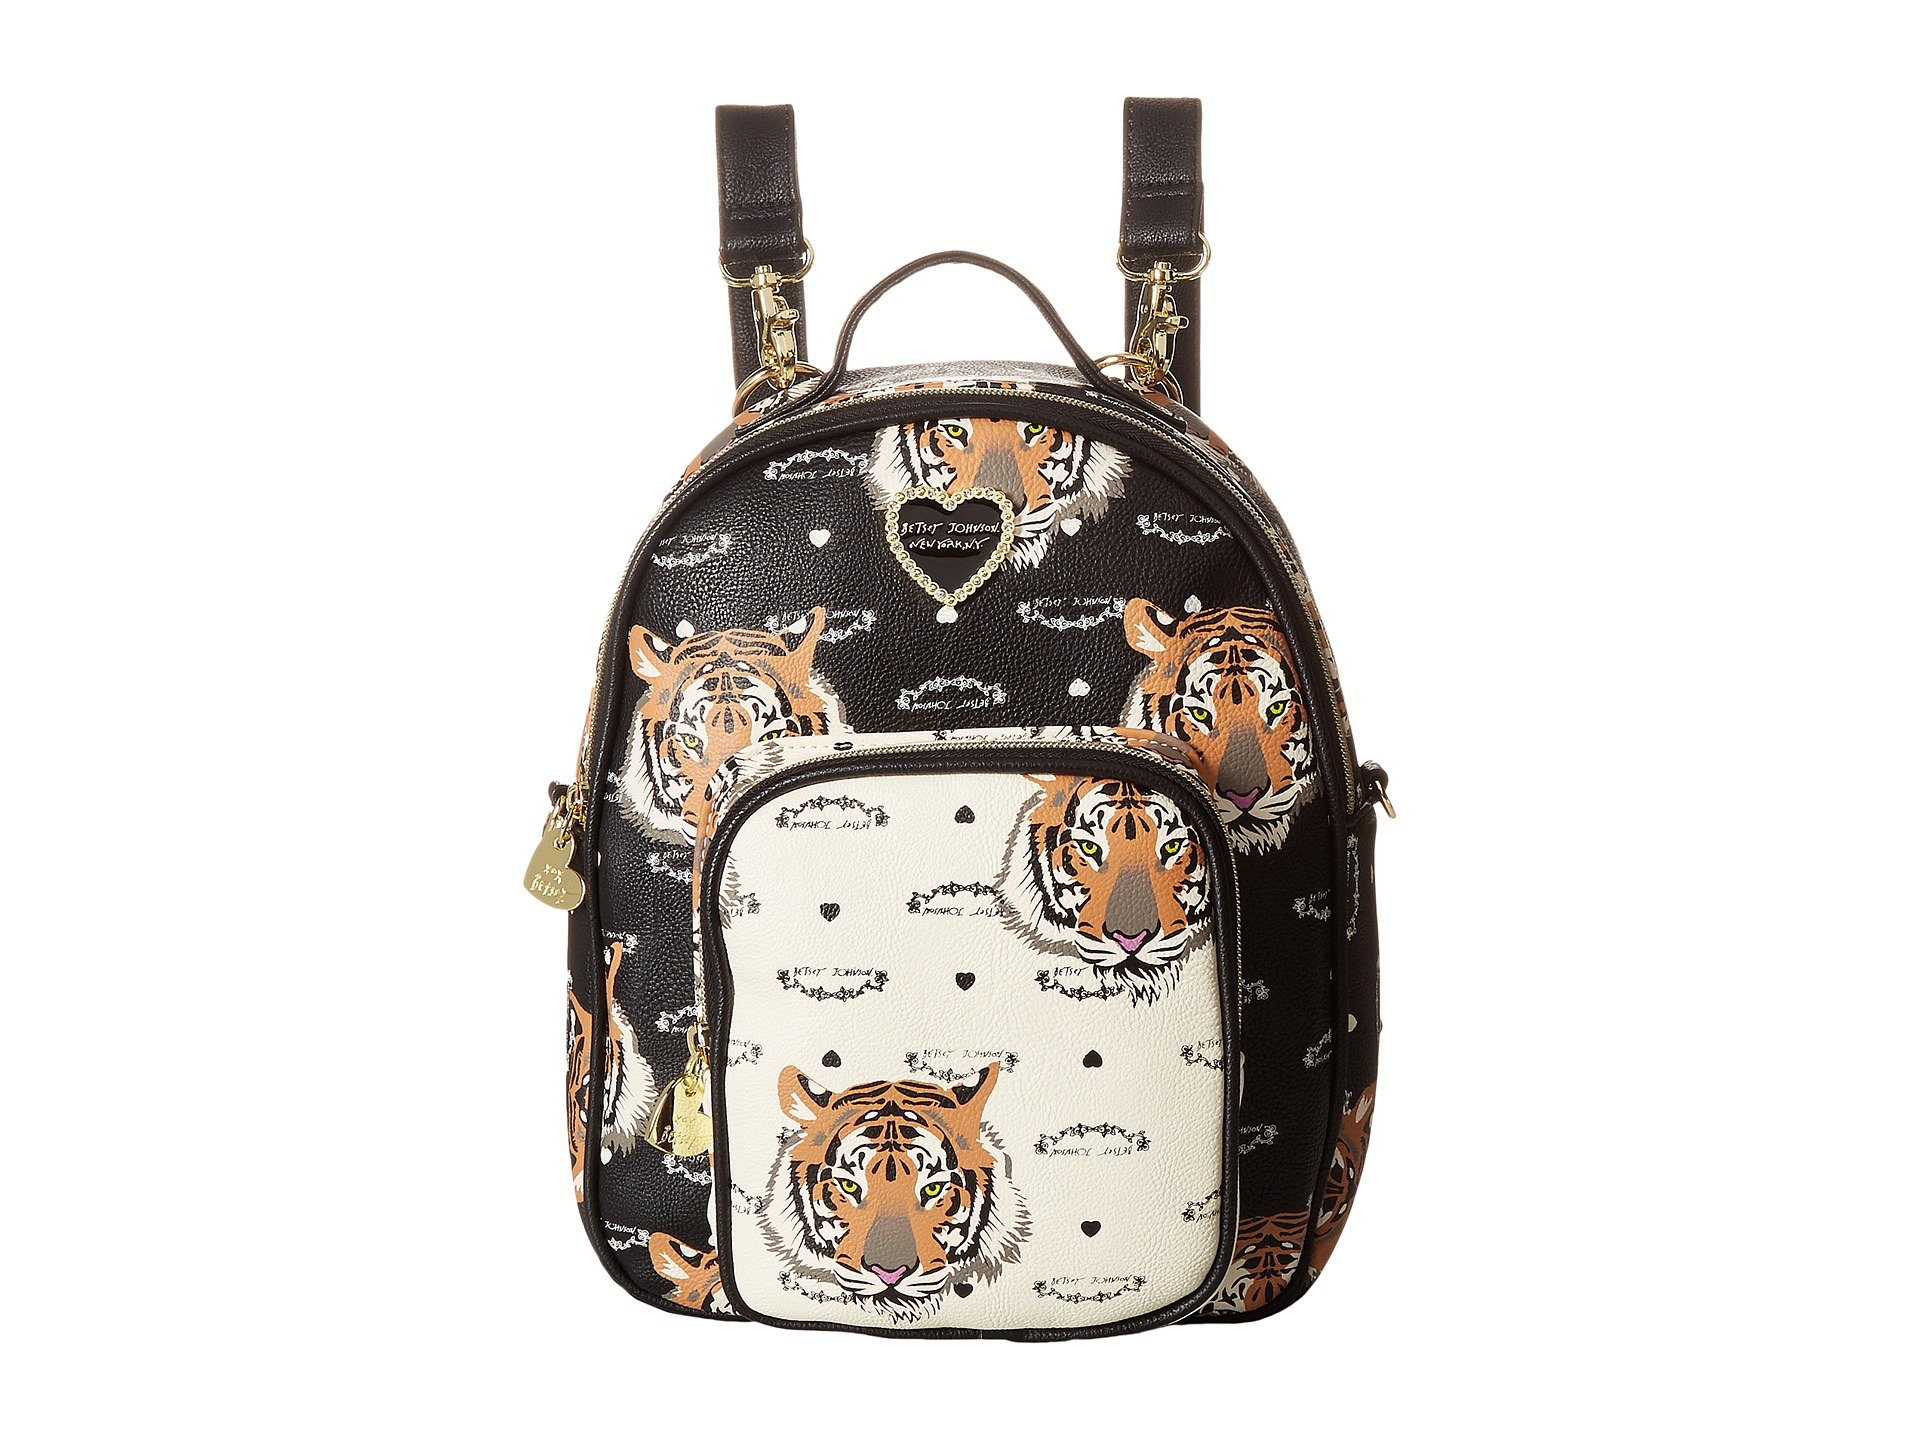 Betsey Johnson Tiger Mini Convertible Travel Luggage Purse Backpacks Tote Bag - Black/Cream